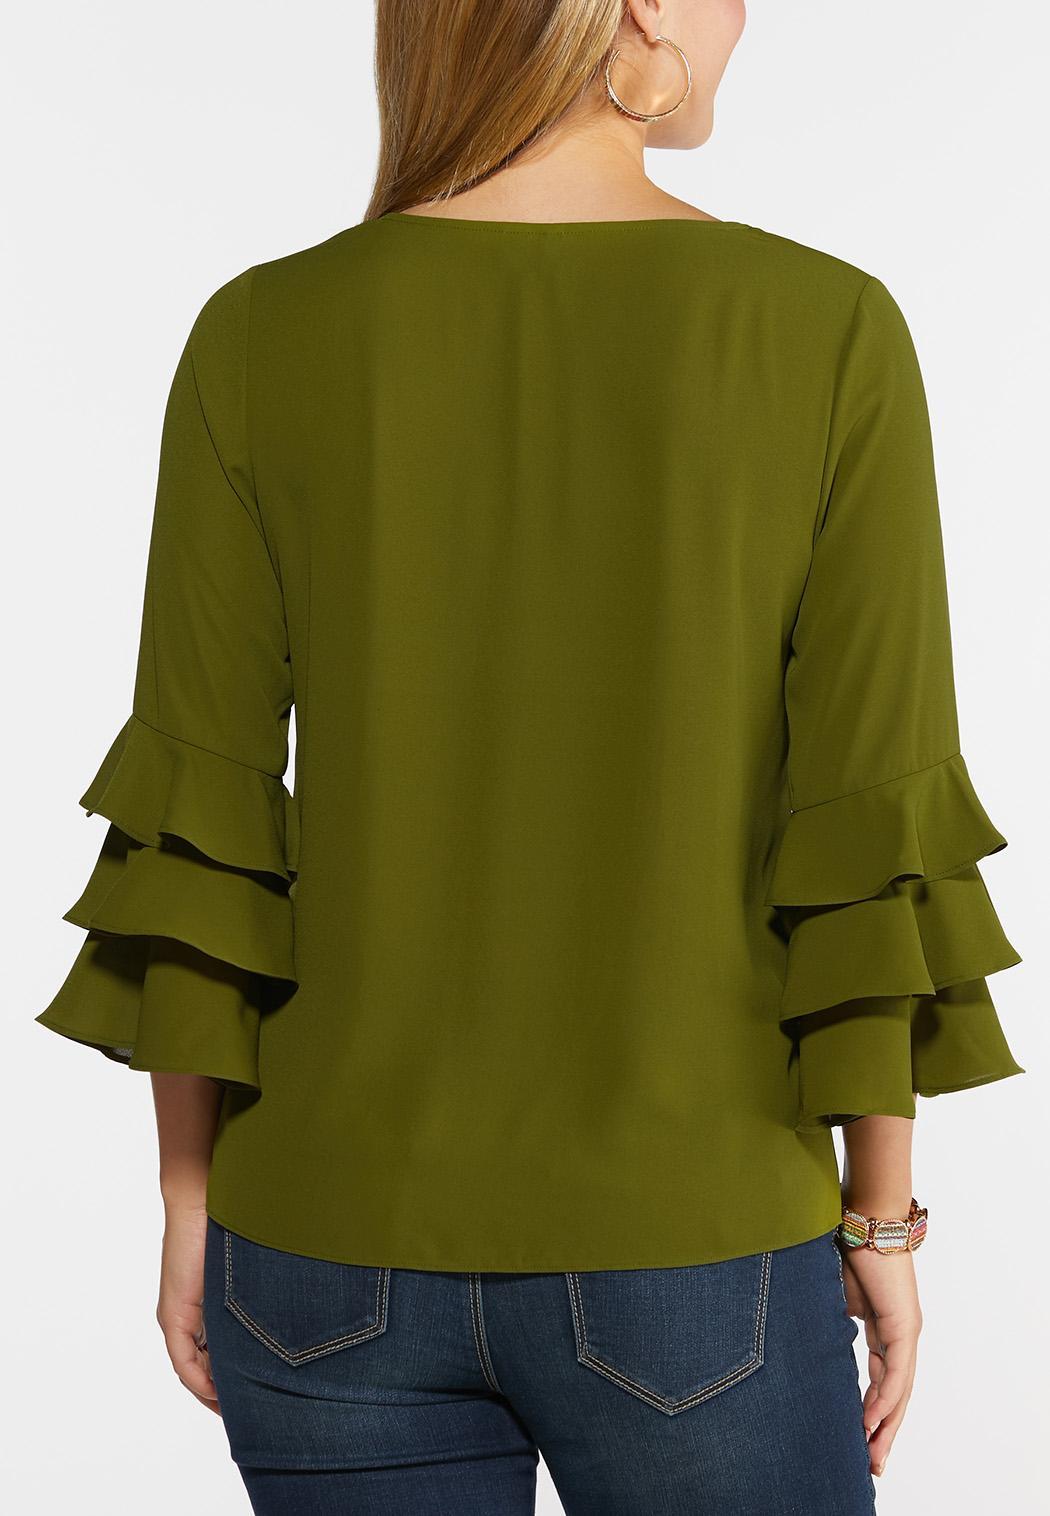 Triple Ruffled Sleeve Top (Item #44337783)